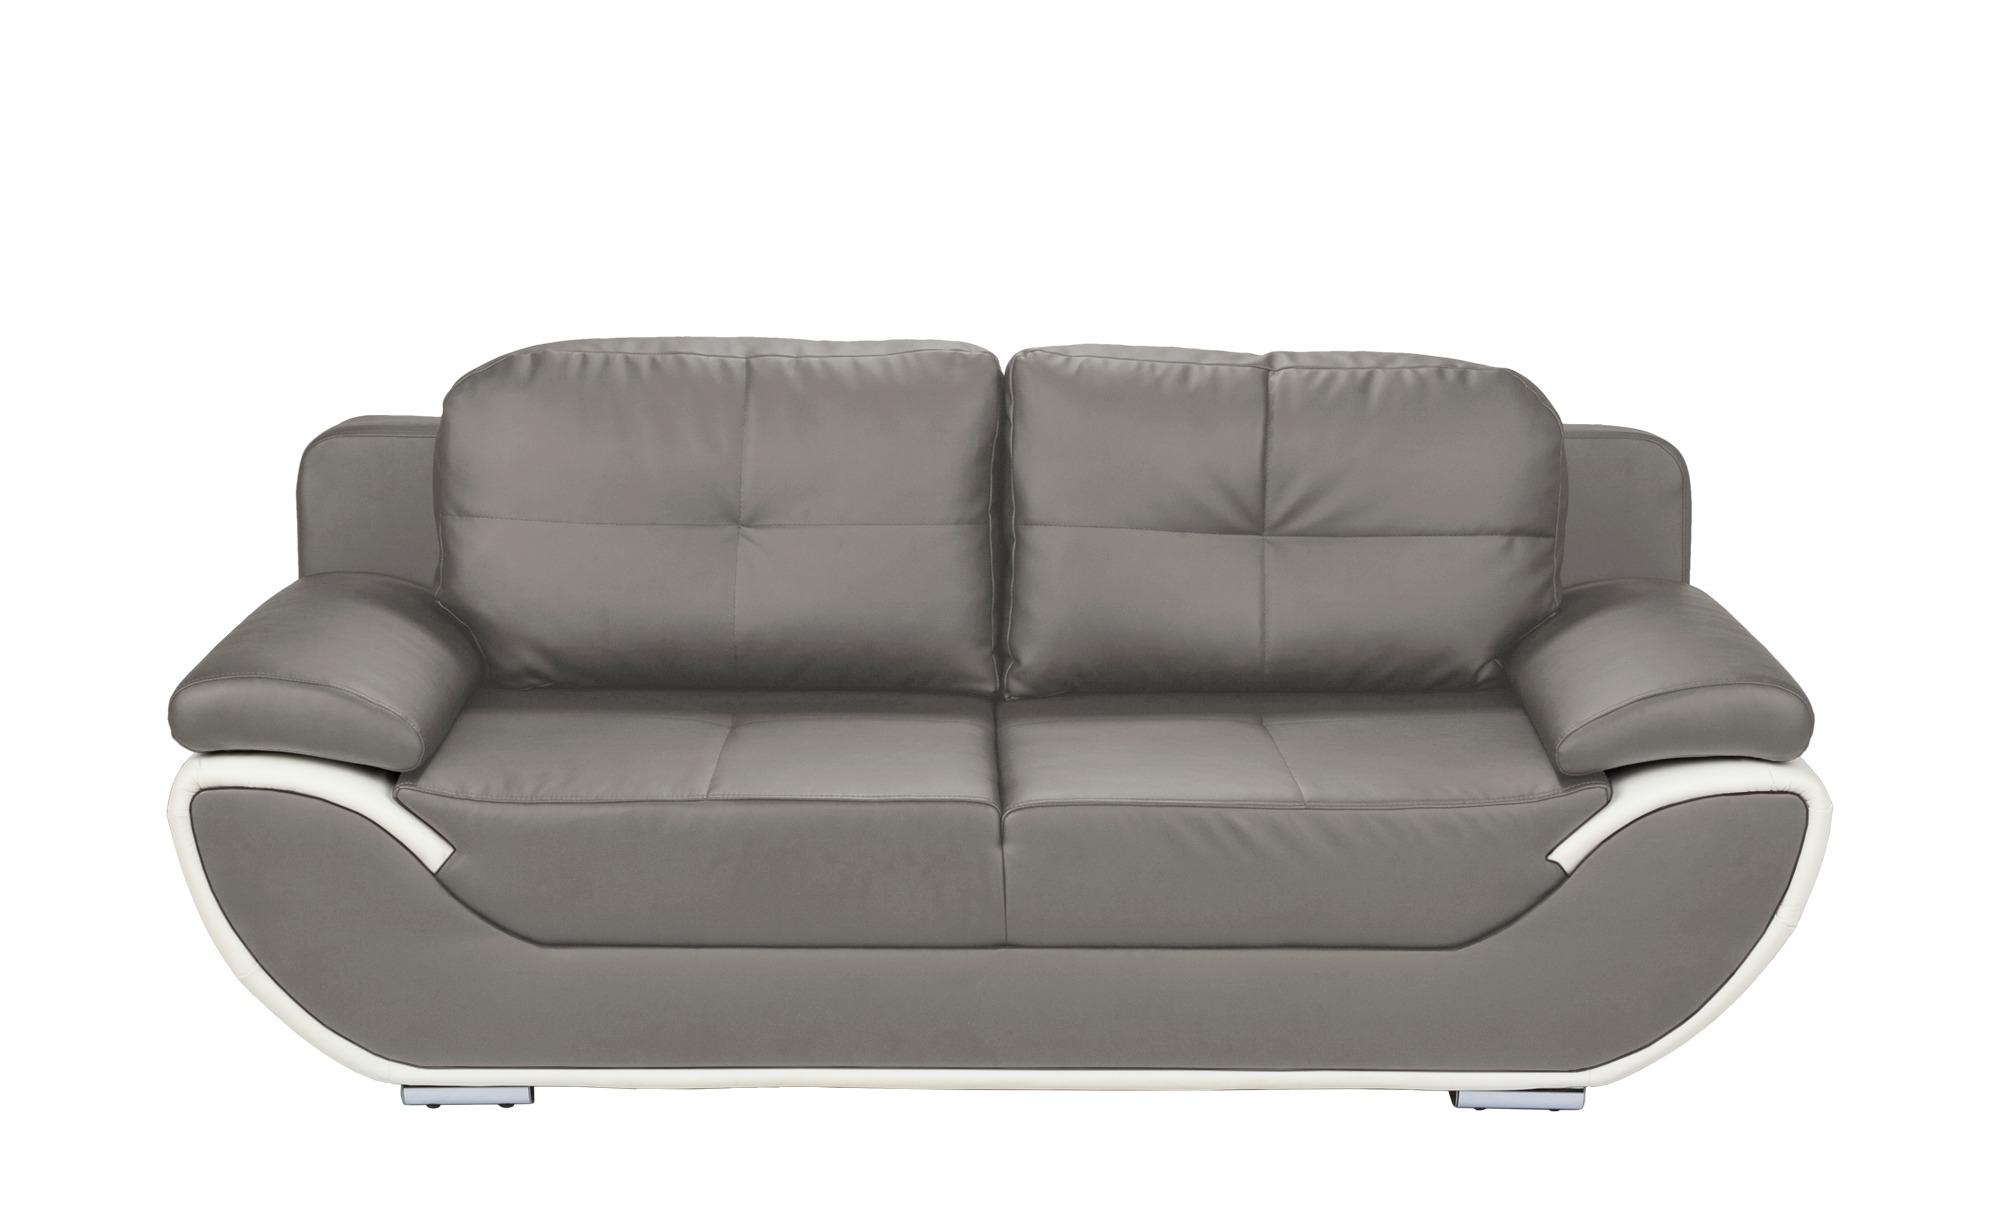 smart Design-Schlafsofa grau/weiß - Kunstleder Adina ¦ grau ¦ Maße (cm): B: 204 H: 90 T: 92 Polstermöbel > Sofas > 2-Sitzer - Höffner